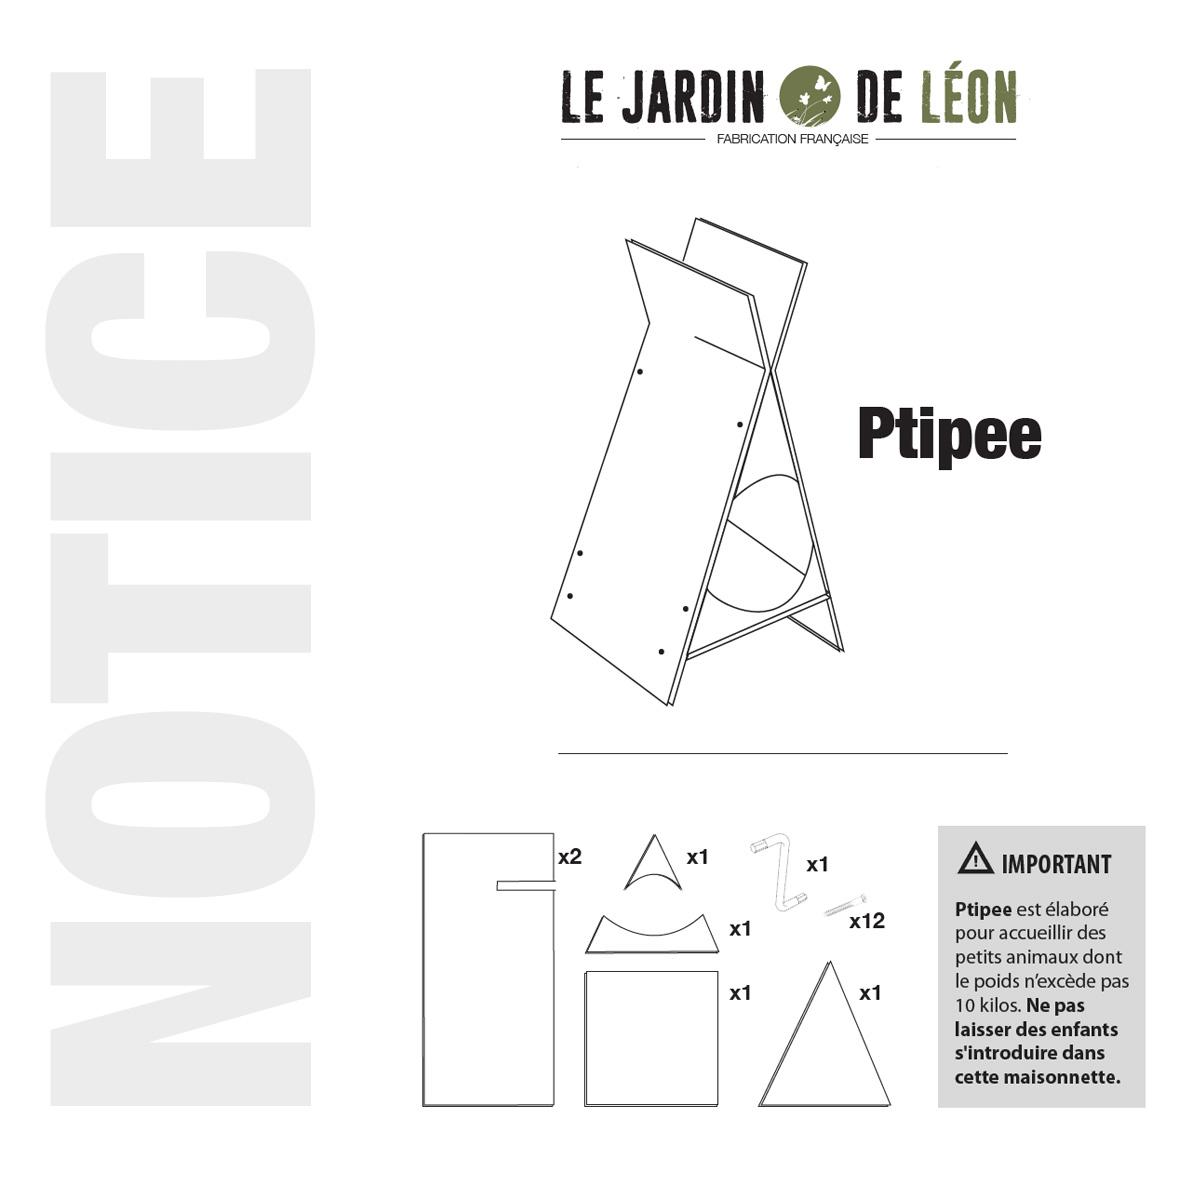 Notice Montage - Ptipee - Page 1 - Le Jardin de Leon